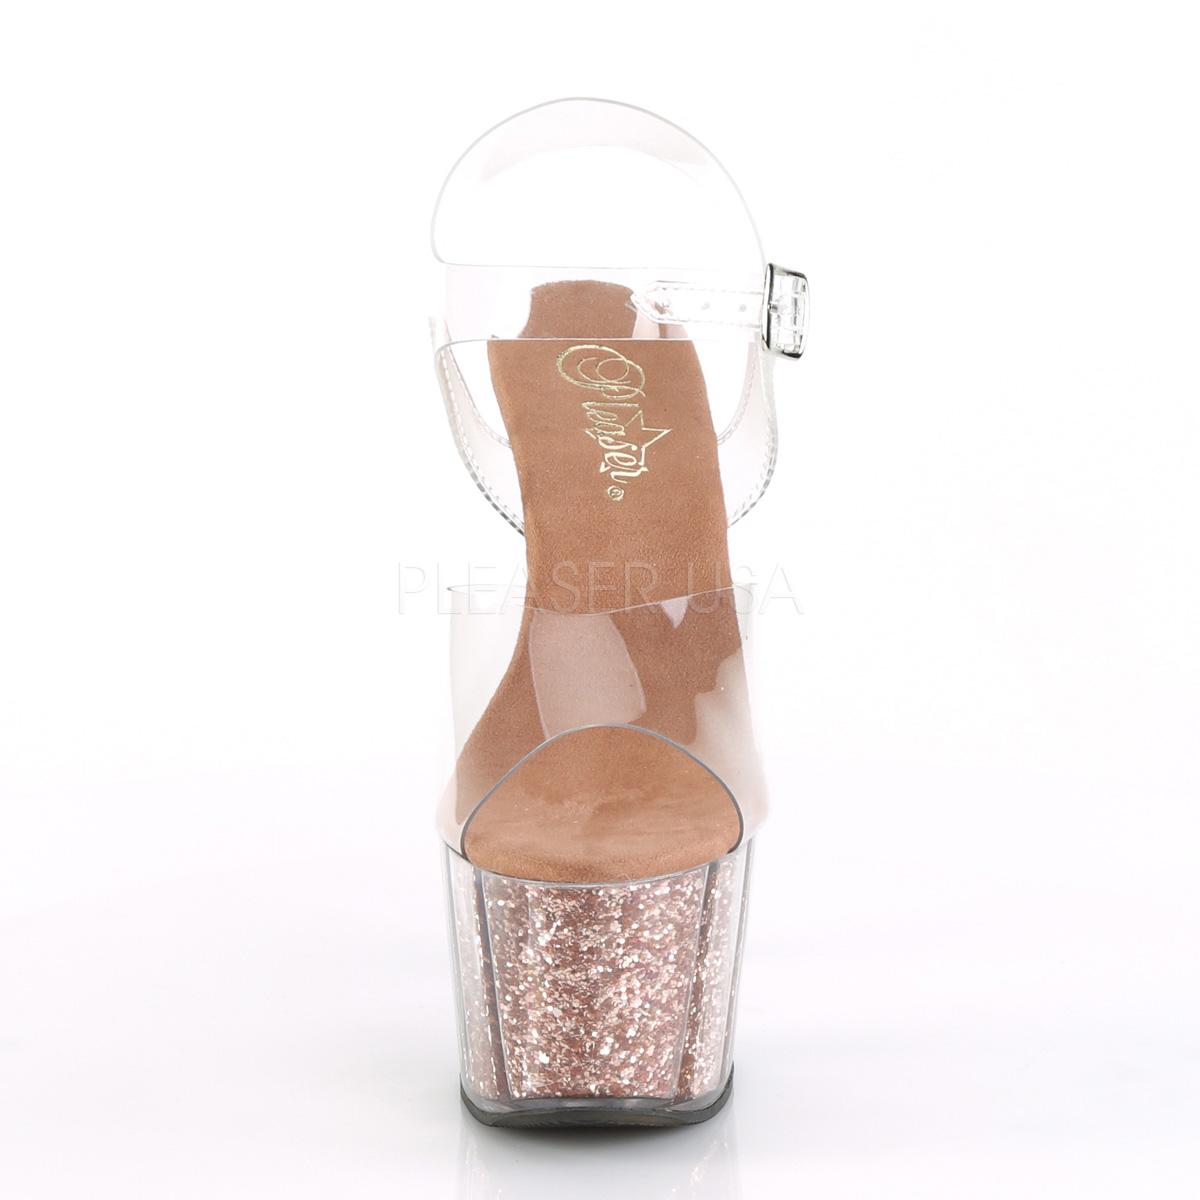 kobber glitter 18 cm Pleaser ADORE 708G pole dancing sko